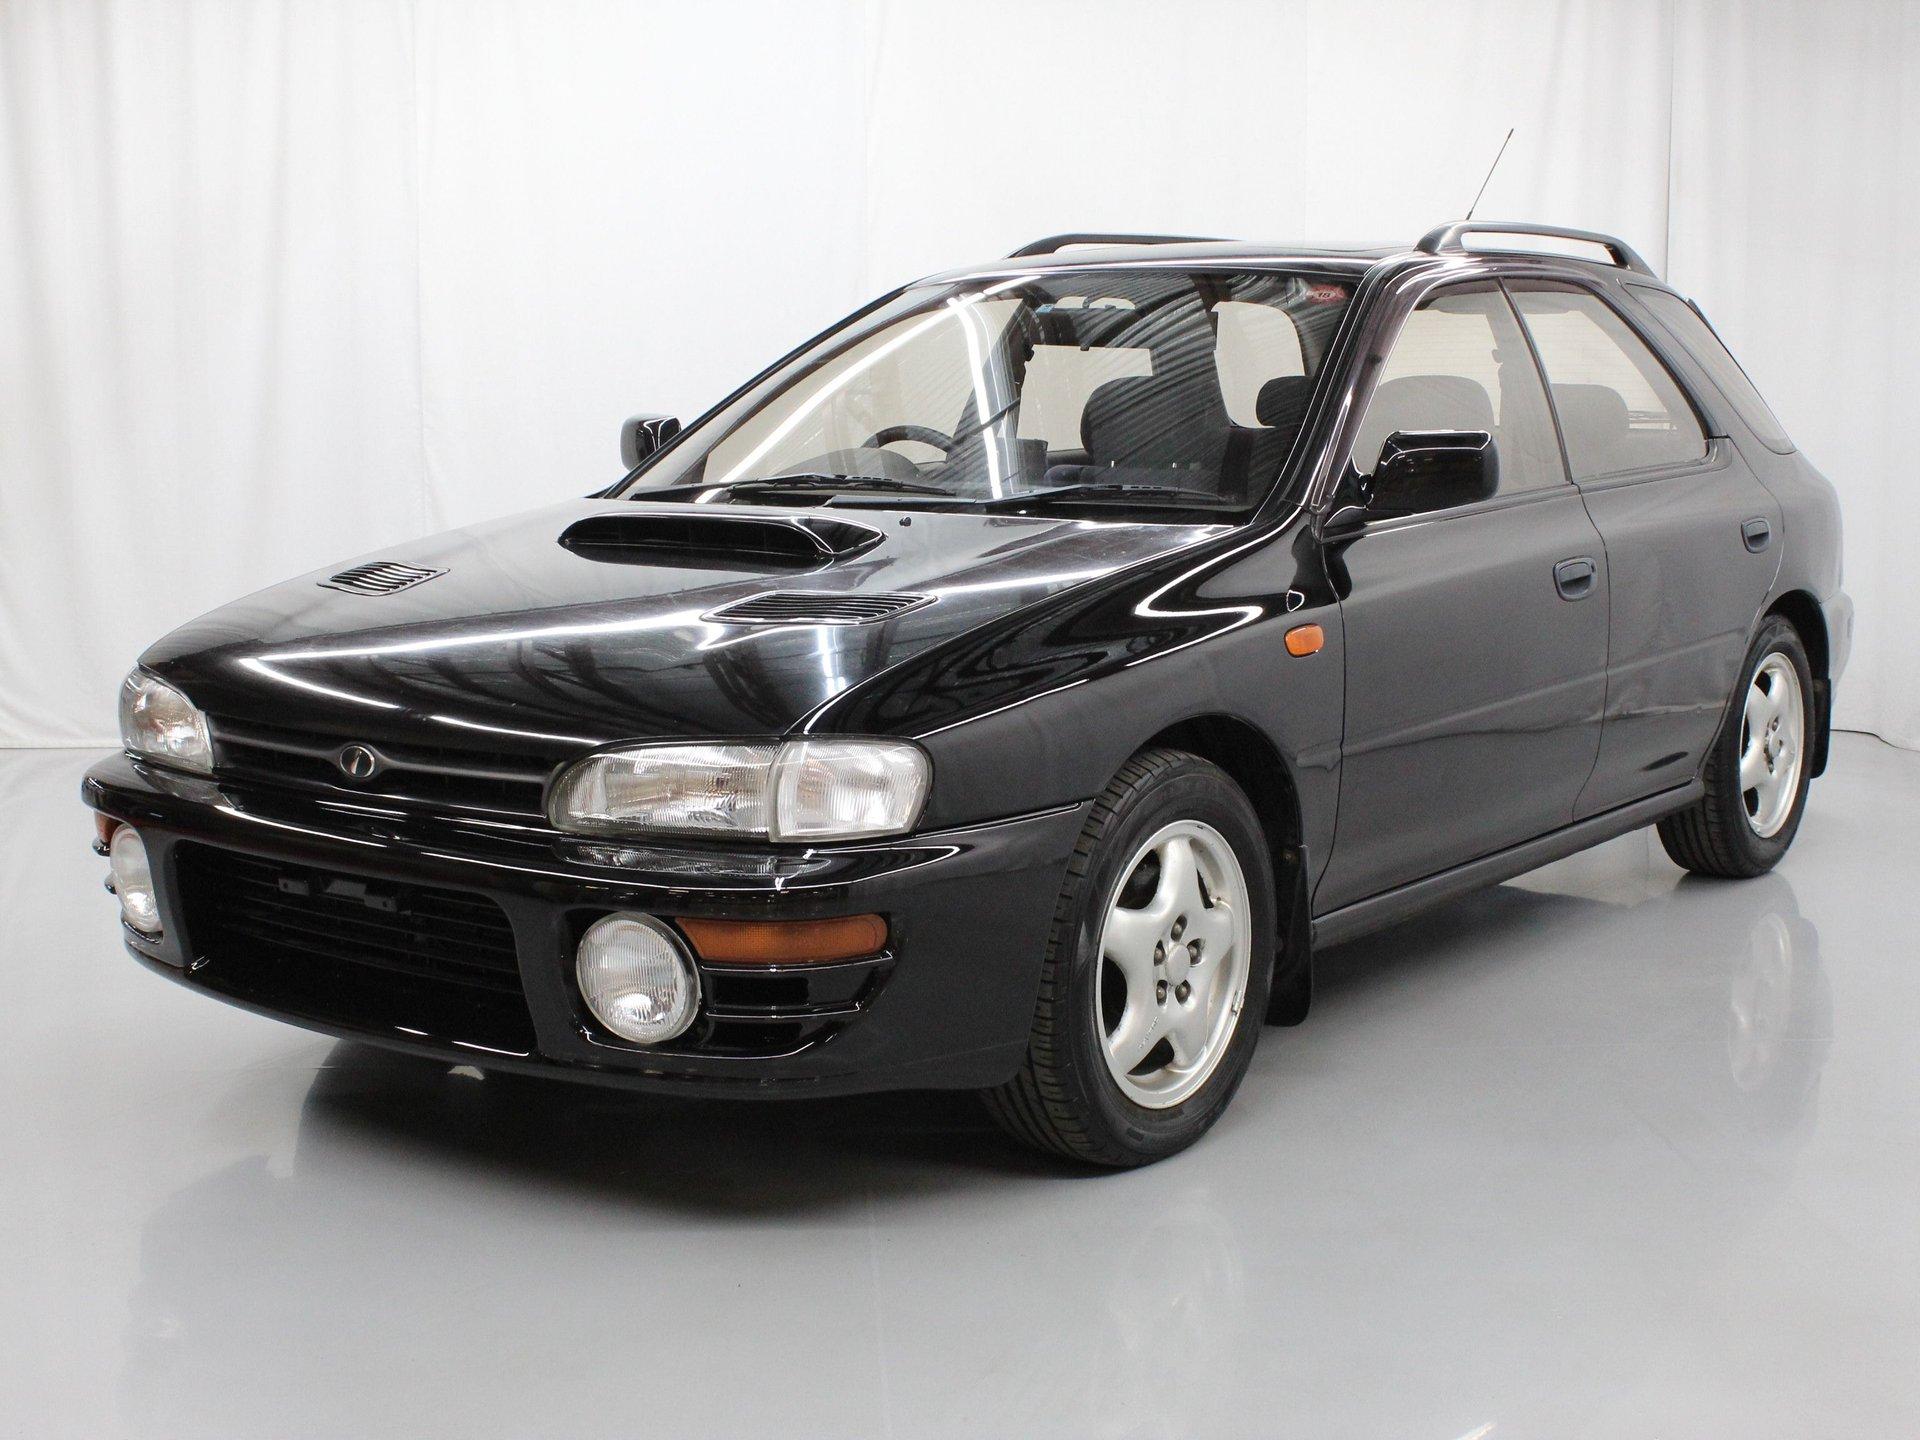 1994 Subaru Impreza WRX